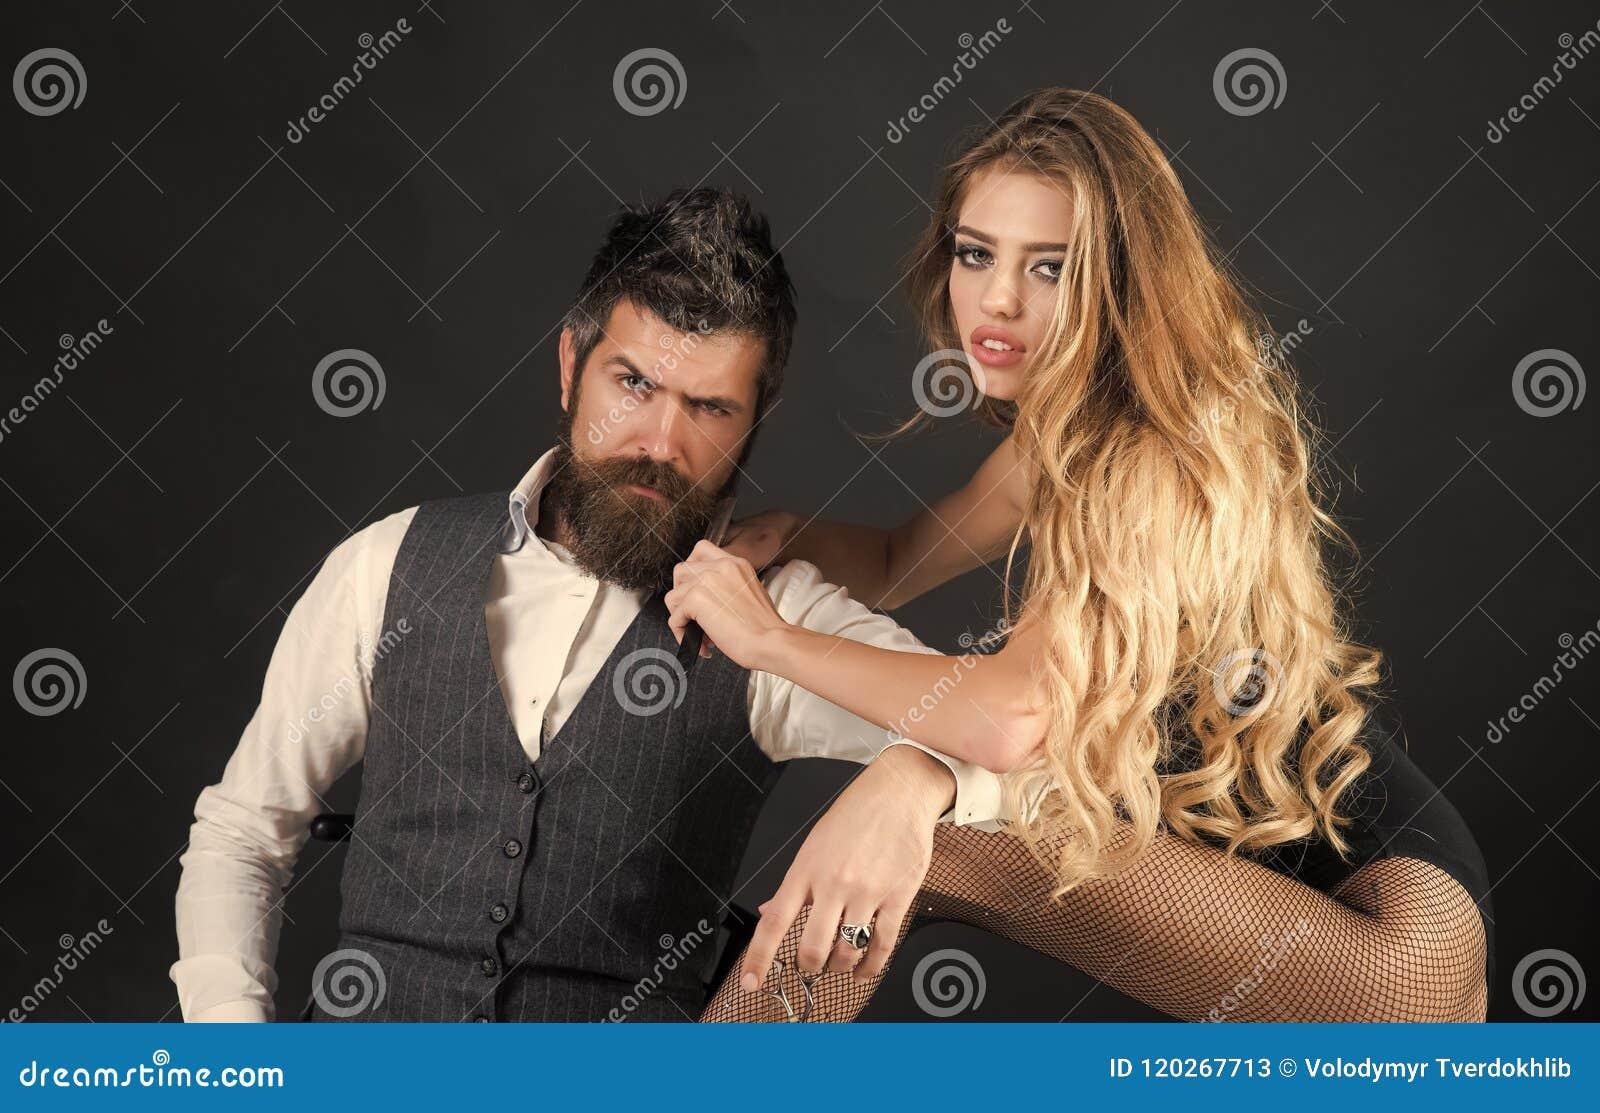 Datieren Liebesbeziehungen Traumwörterbuch datiert verheirateten Mann